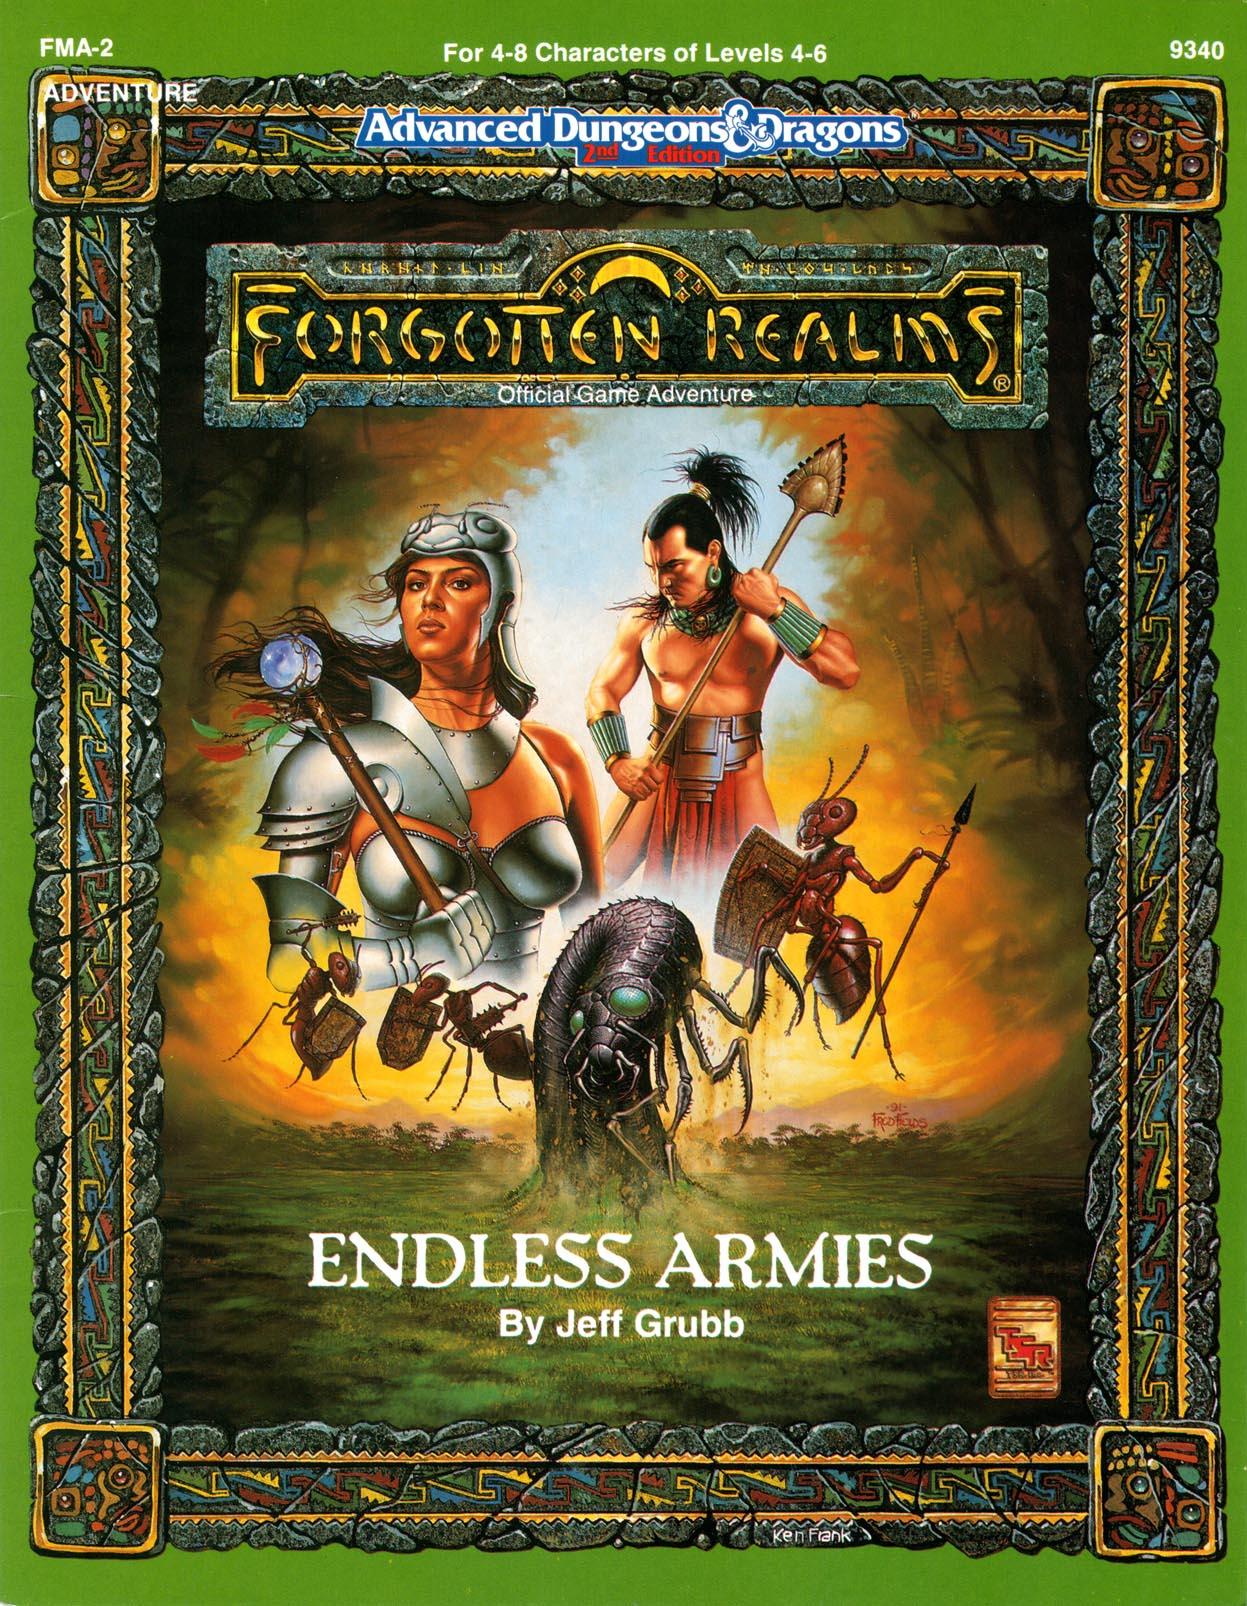 Endless Armies